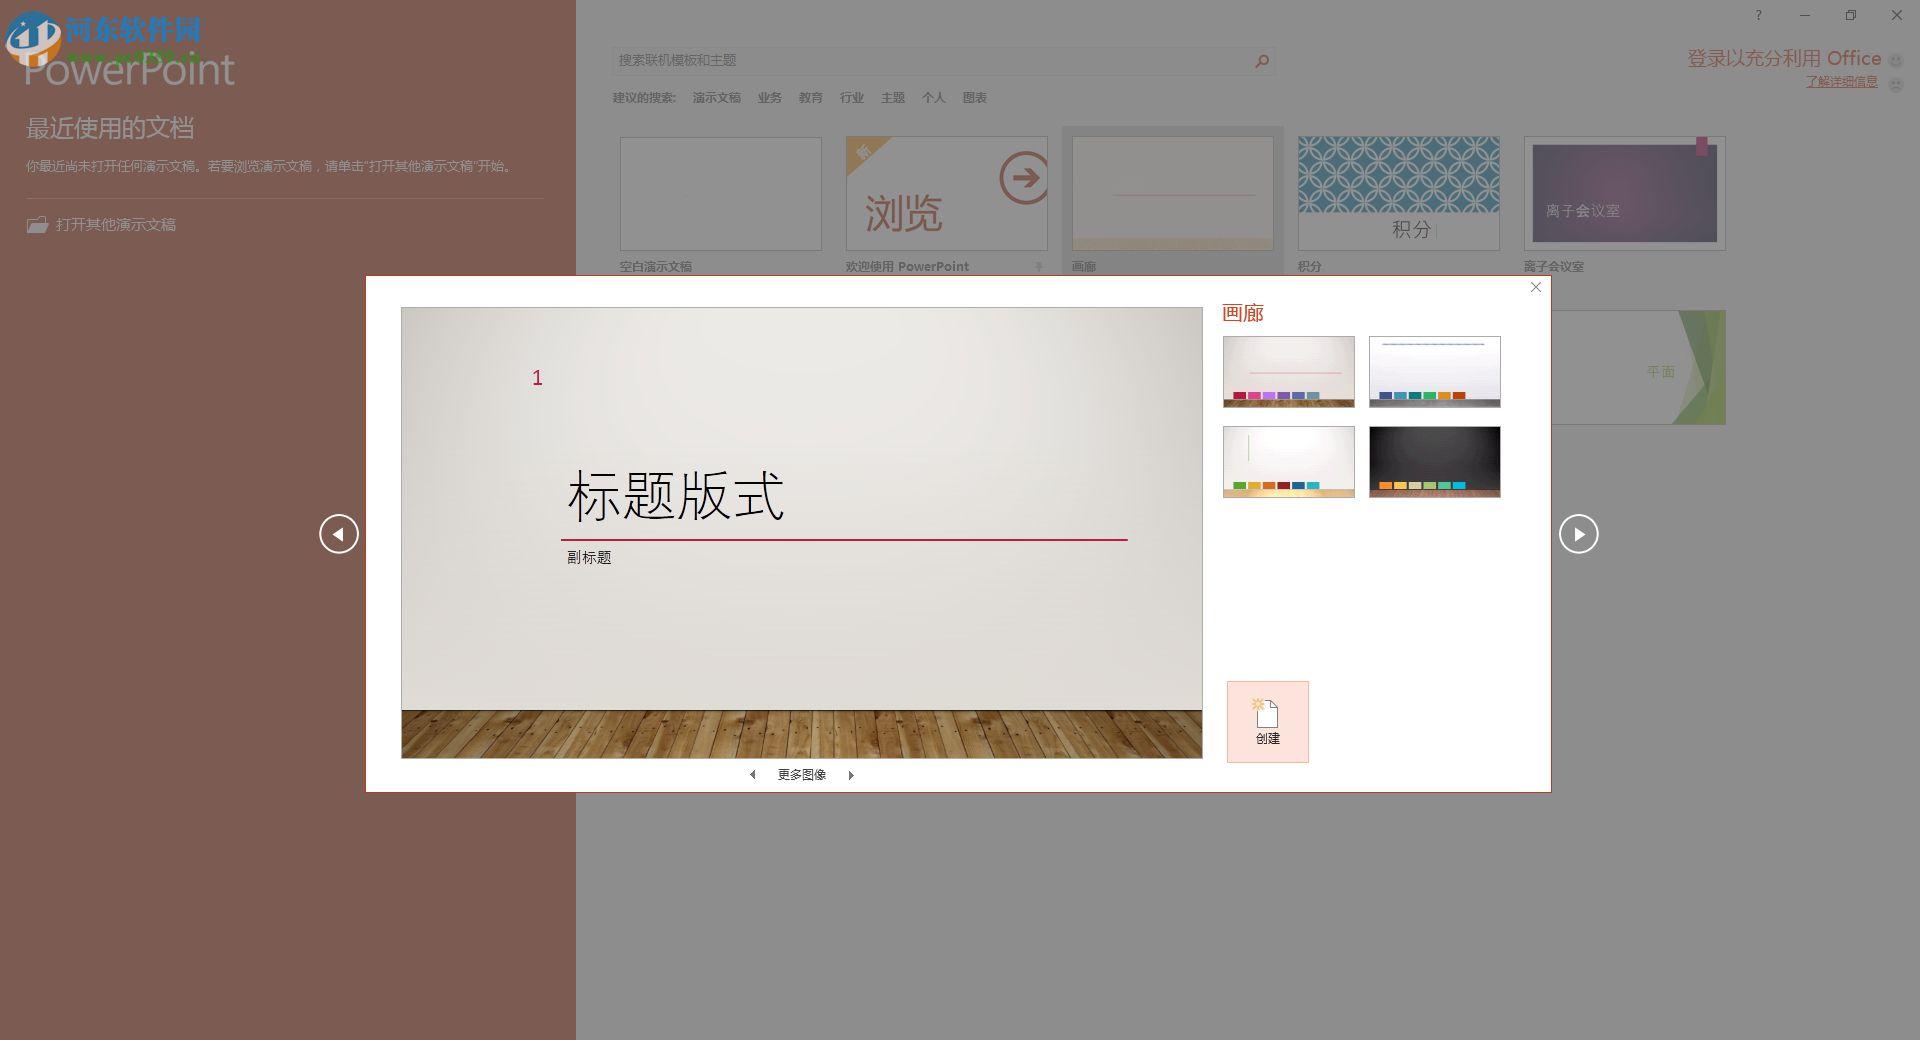 Office 2019 简体中文完整版